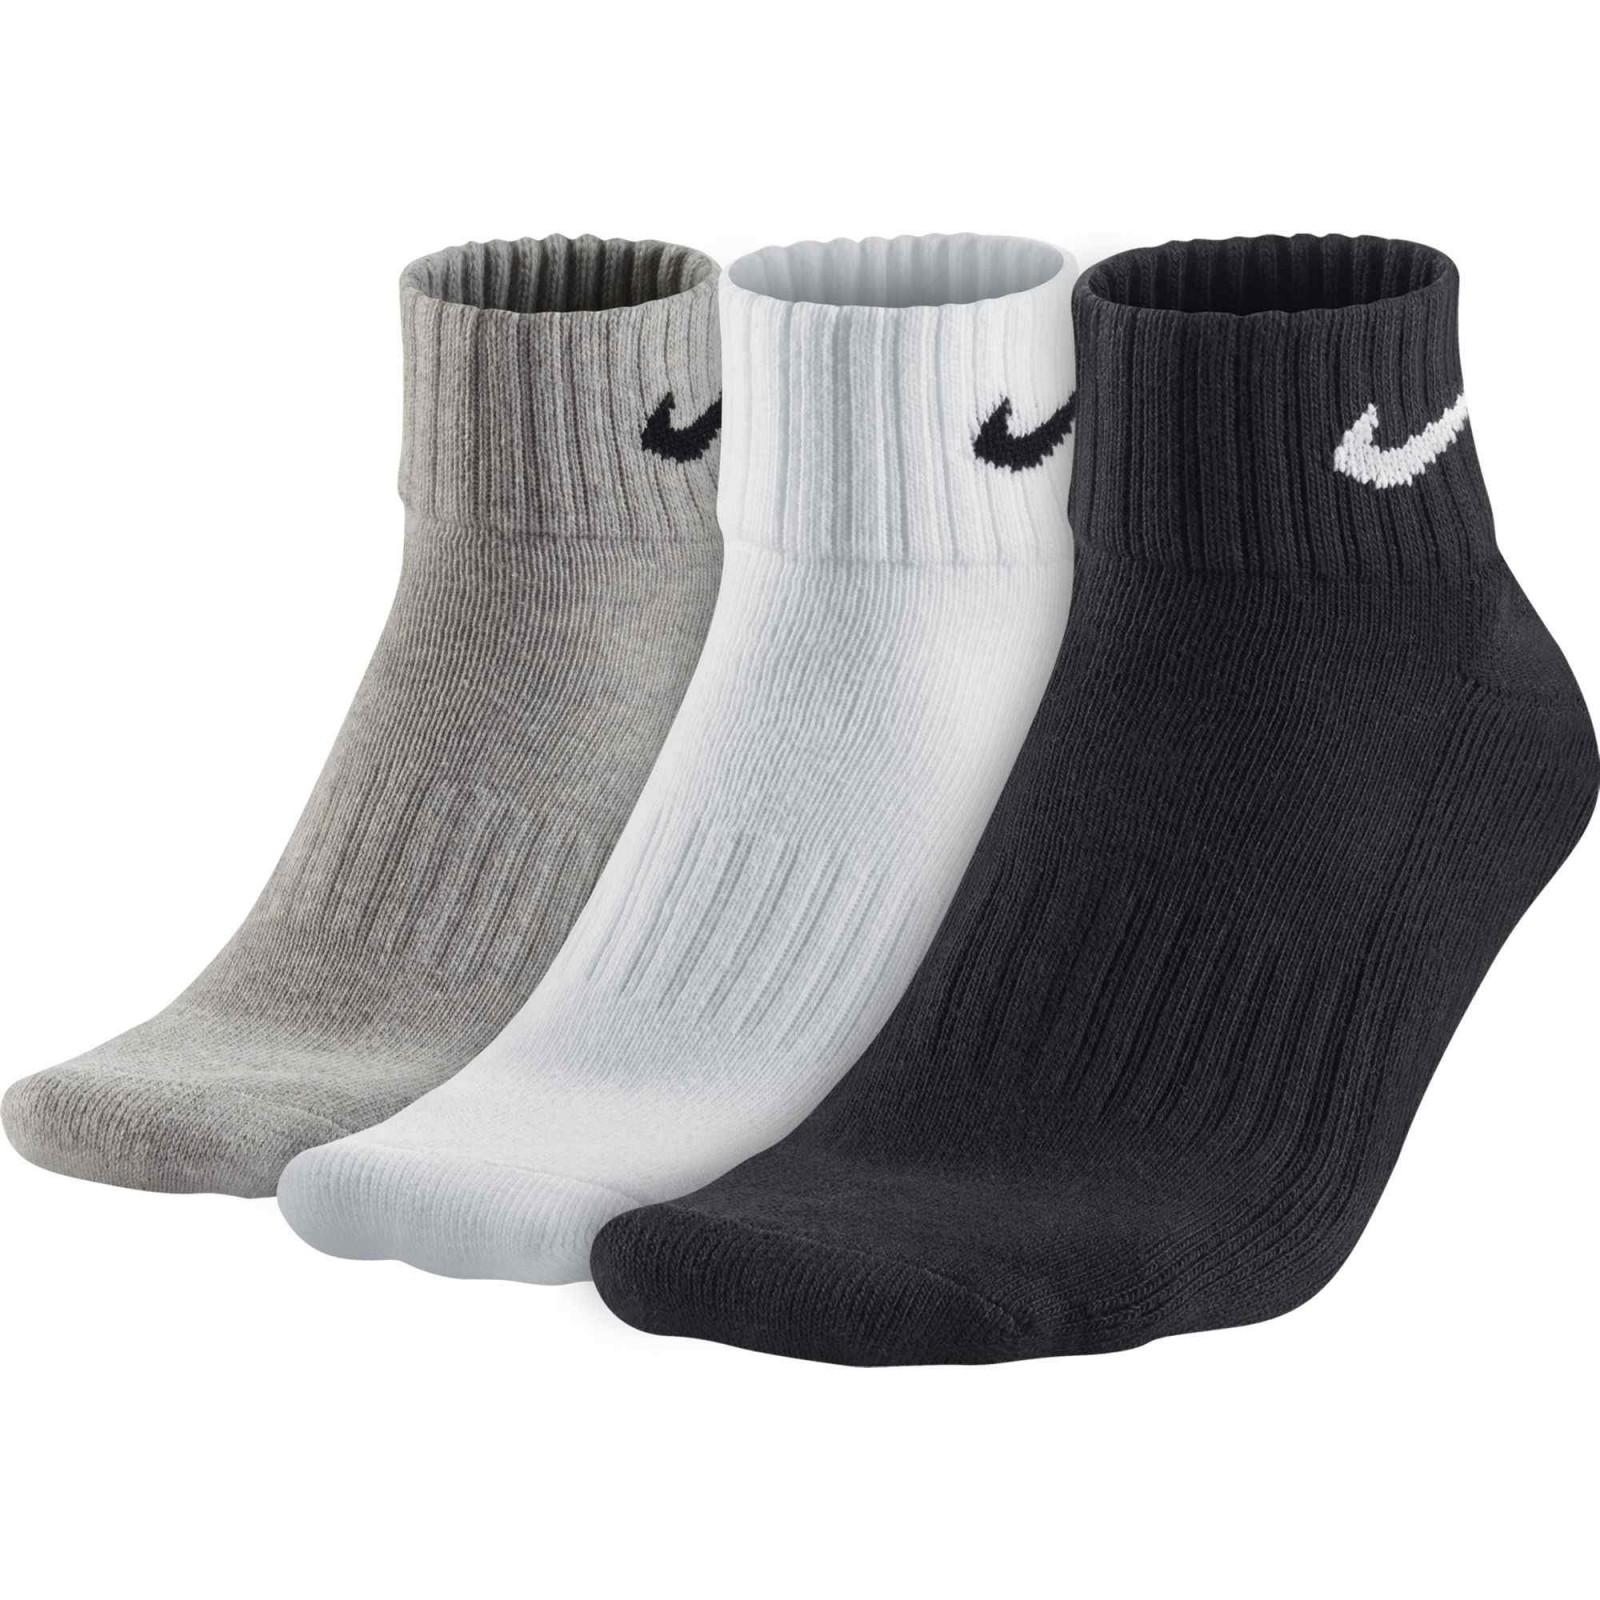 4ae86f9cc2c Pánské ponožky Nike Value Cotton Quarter 3 páry MULTI-COLOR - Glami.sk